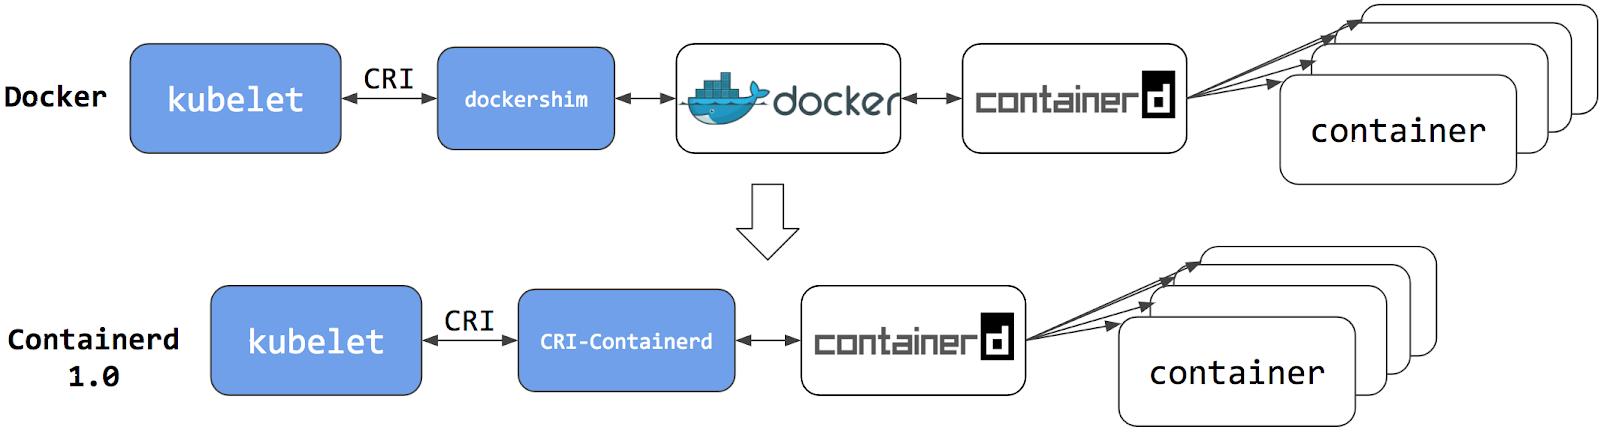 Dockershim vs. CRI with Containerd